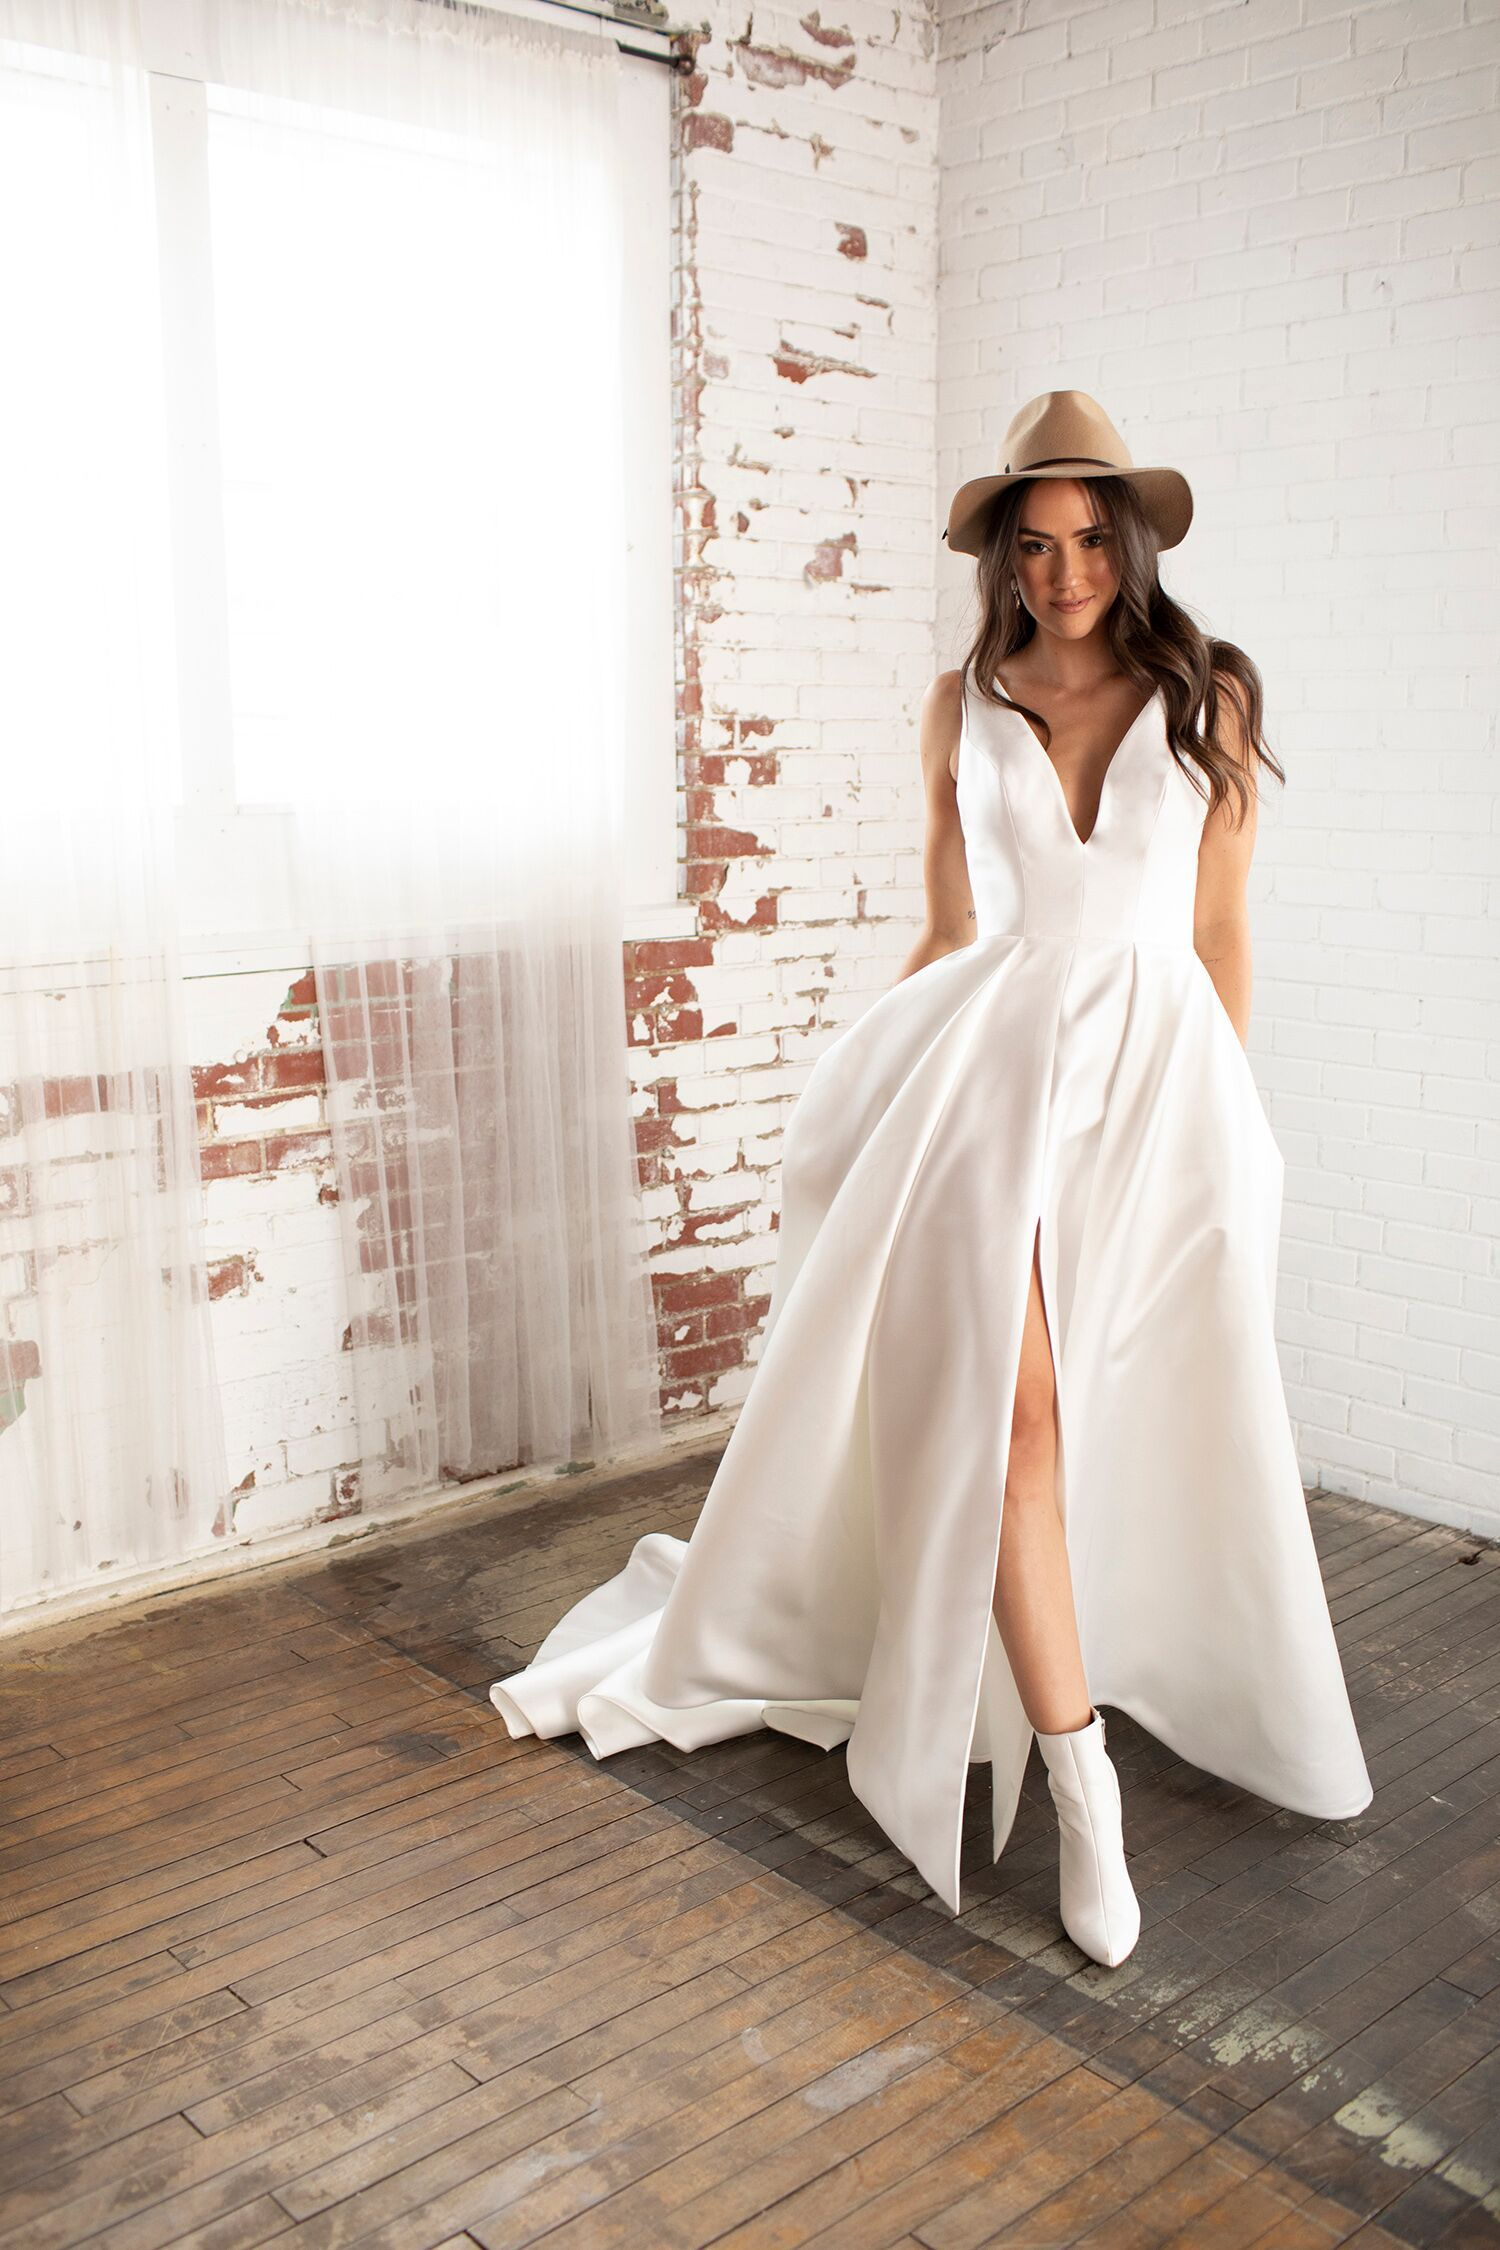 Maeve Sleek Wedding Dress By Barbara Kavchok Wedding Dress Boots White Wedding Boots Sleek Wedding Dress [ 2250 x 1500 Pixel ]